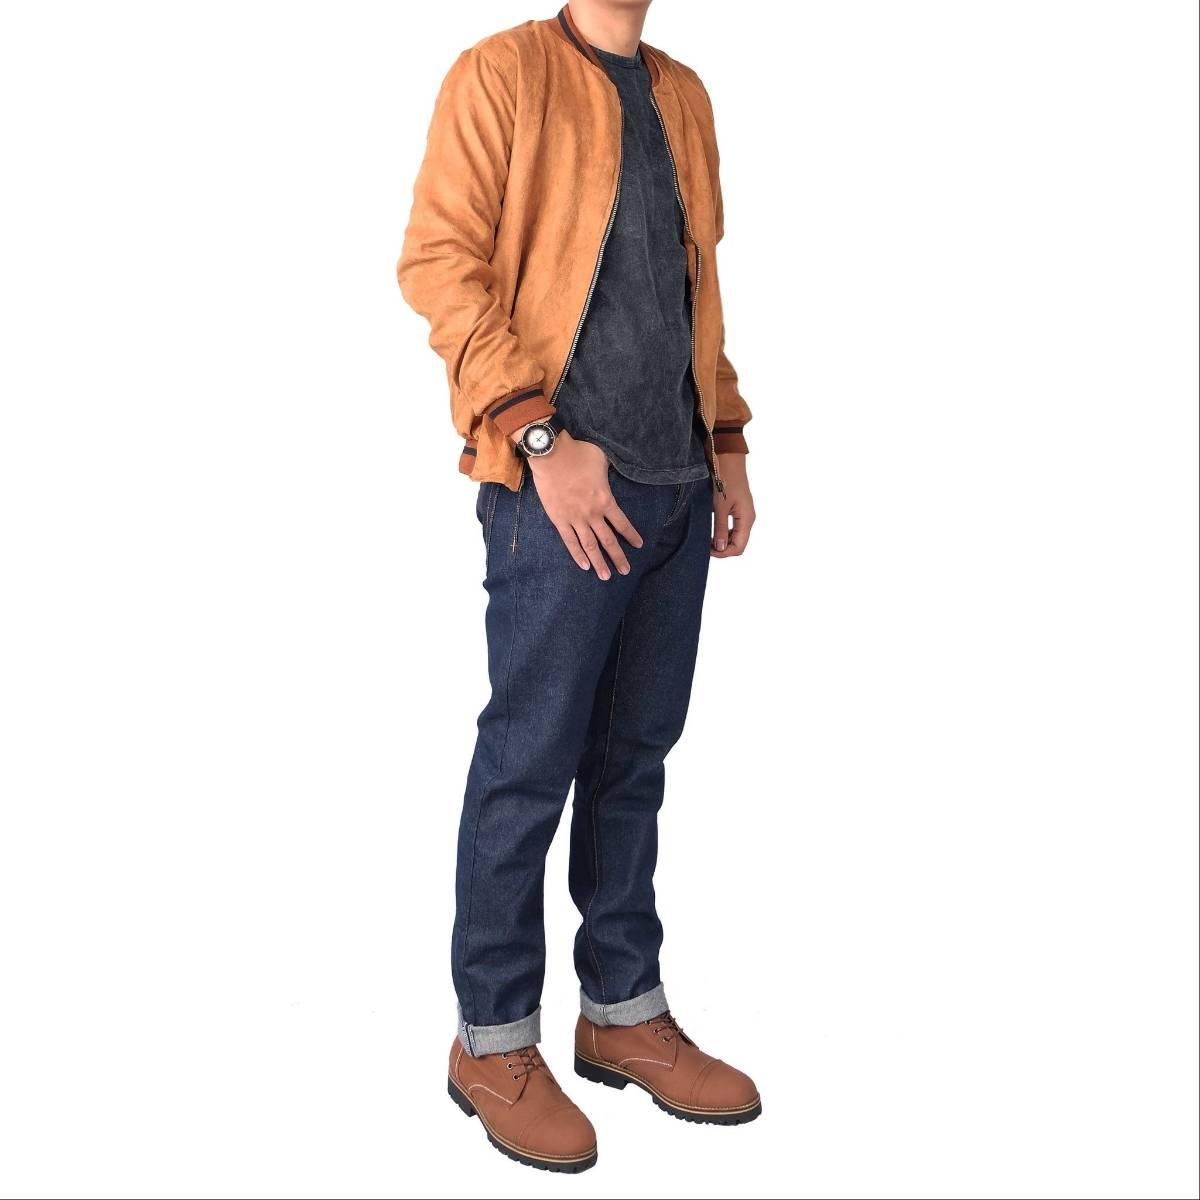 Celana Panjang Jeans / Street Wanderers Dry Rigid I